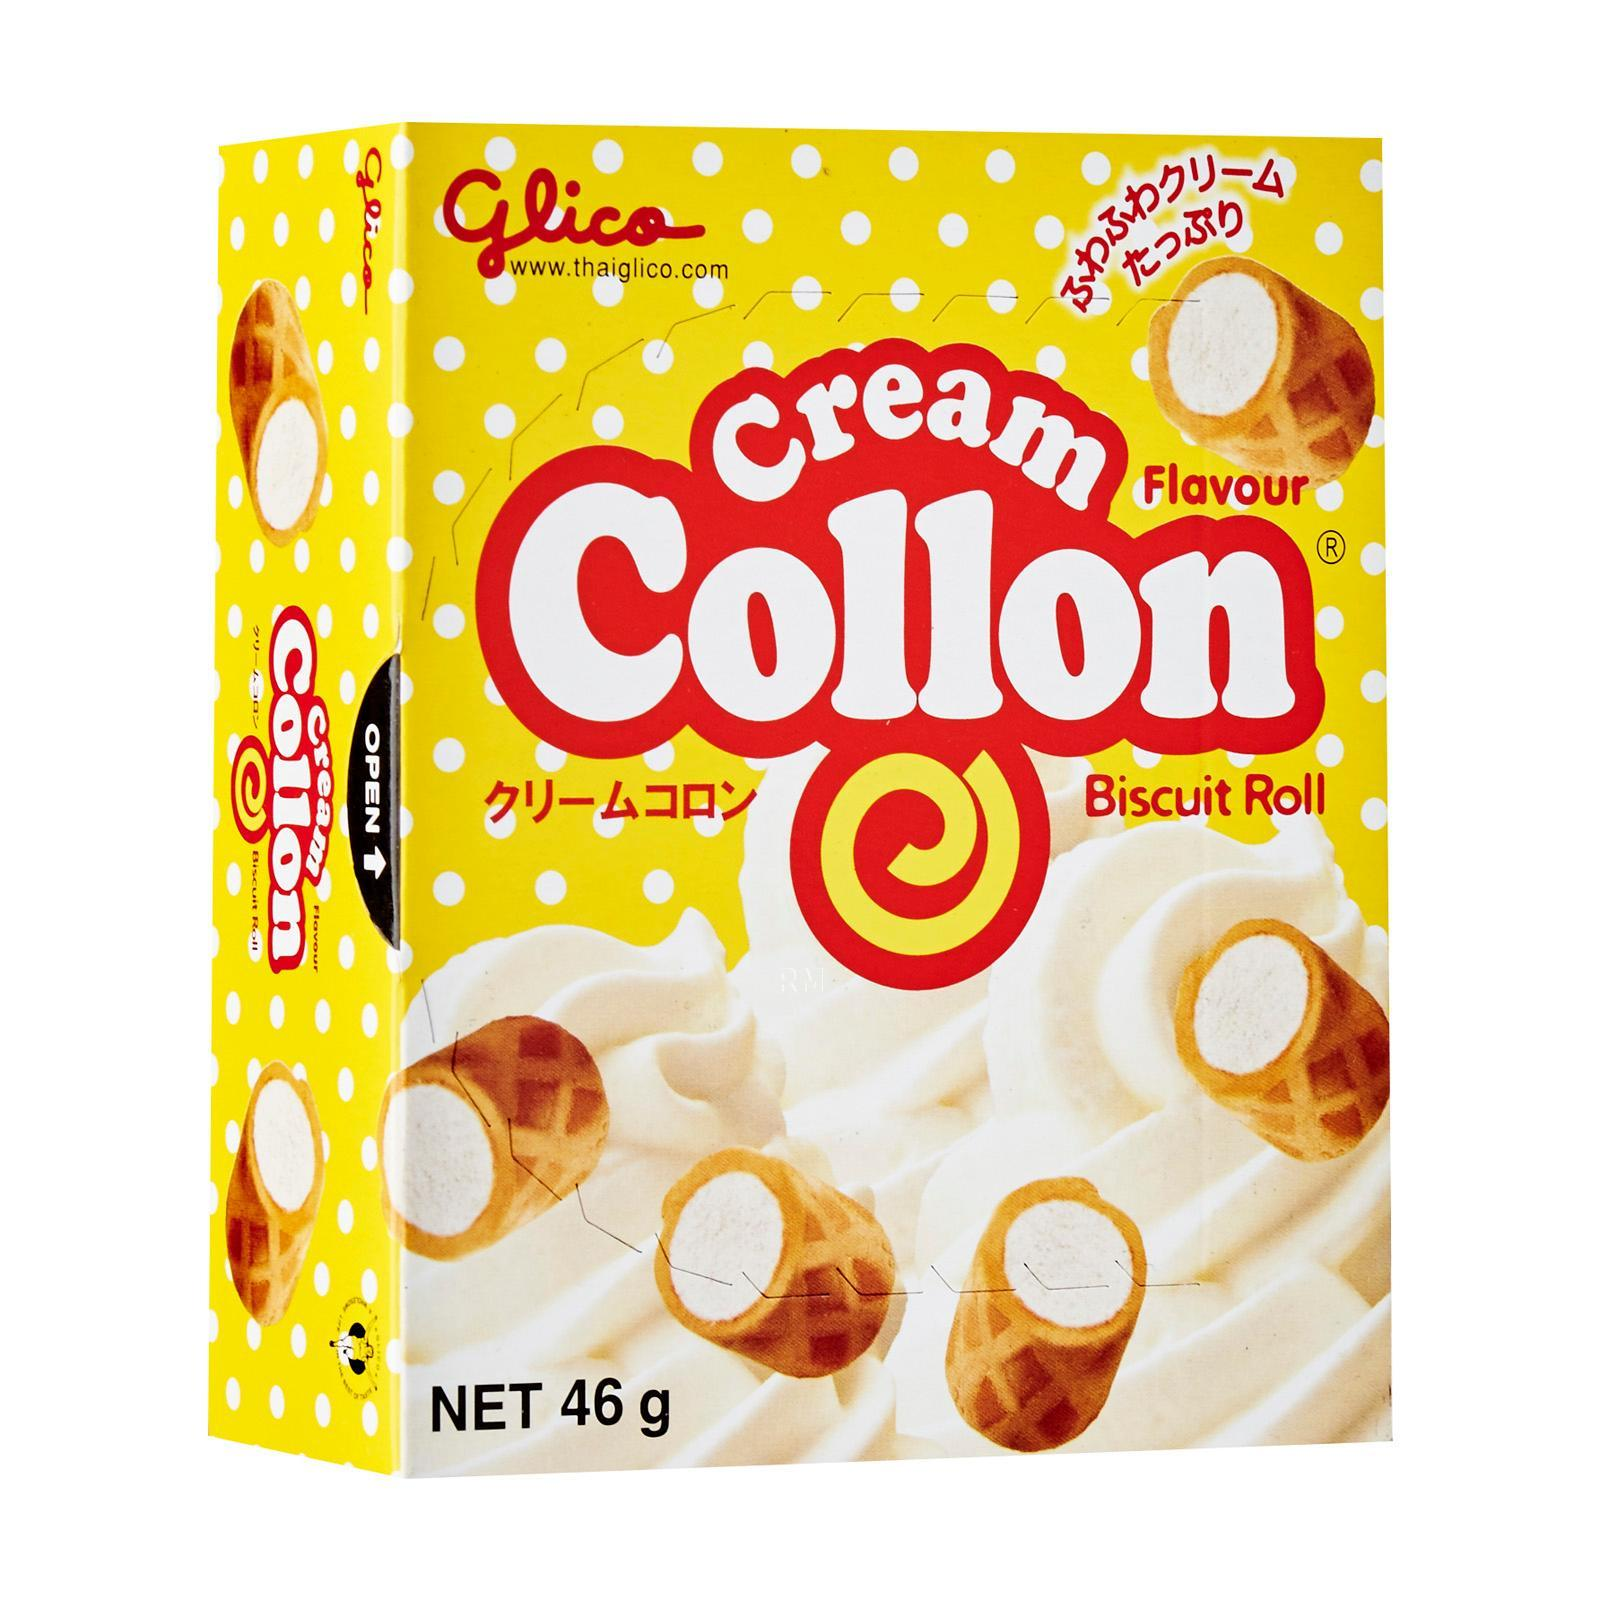 Collon Cream Biscuit Roll